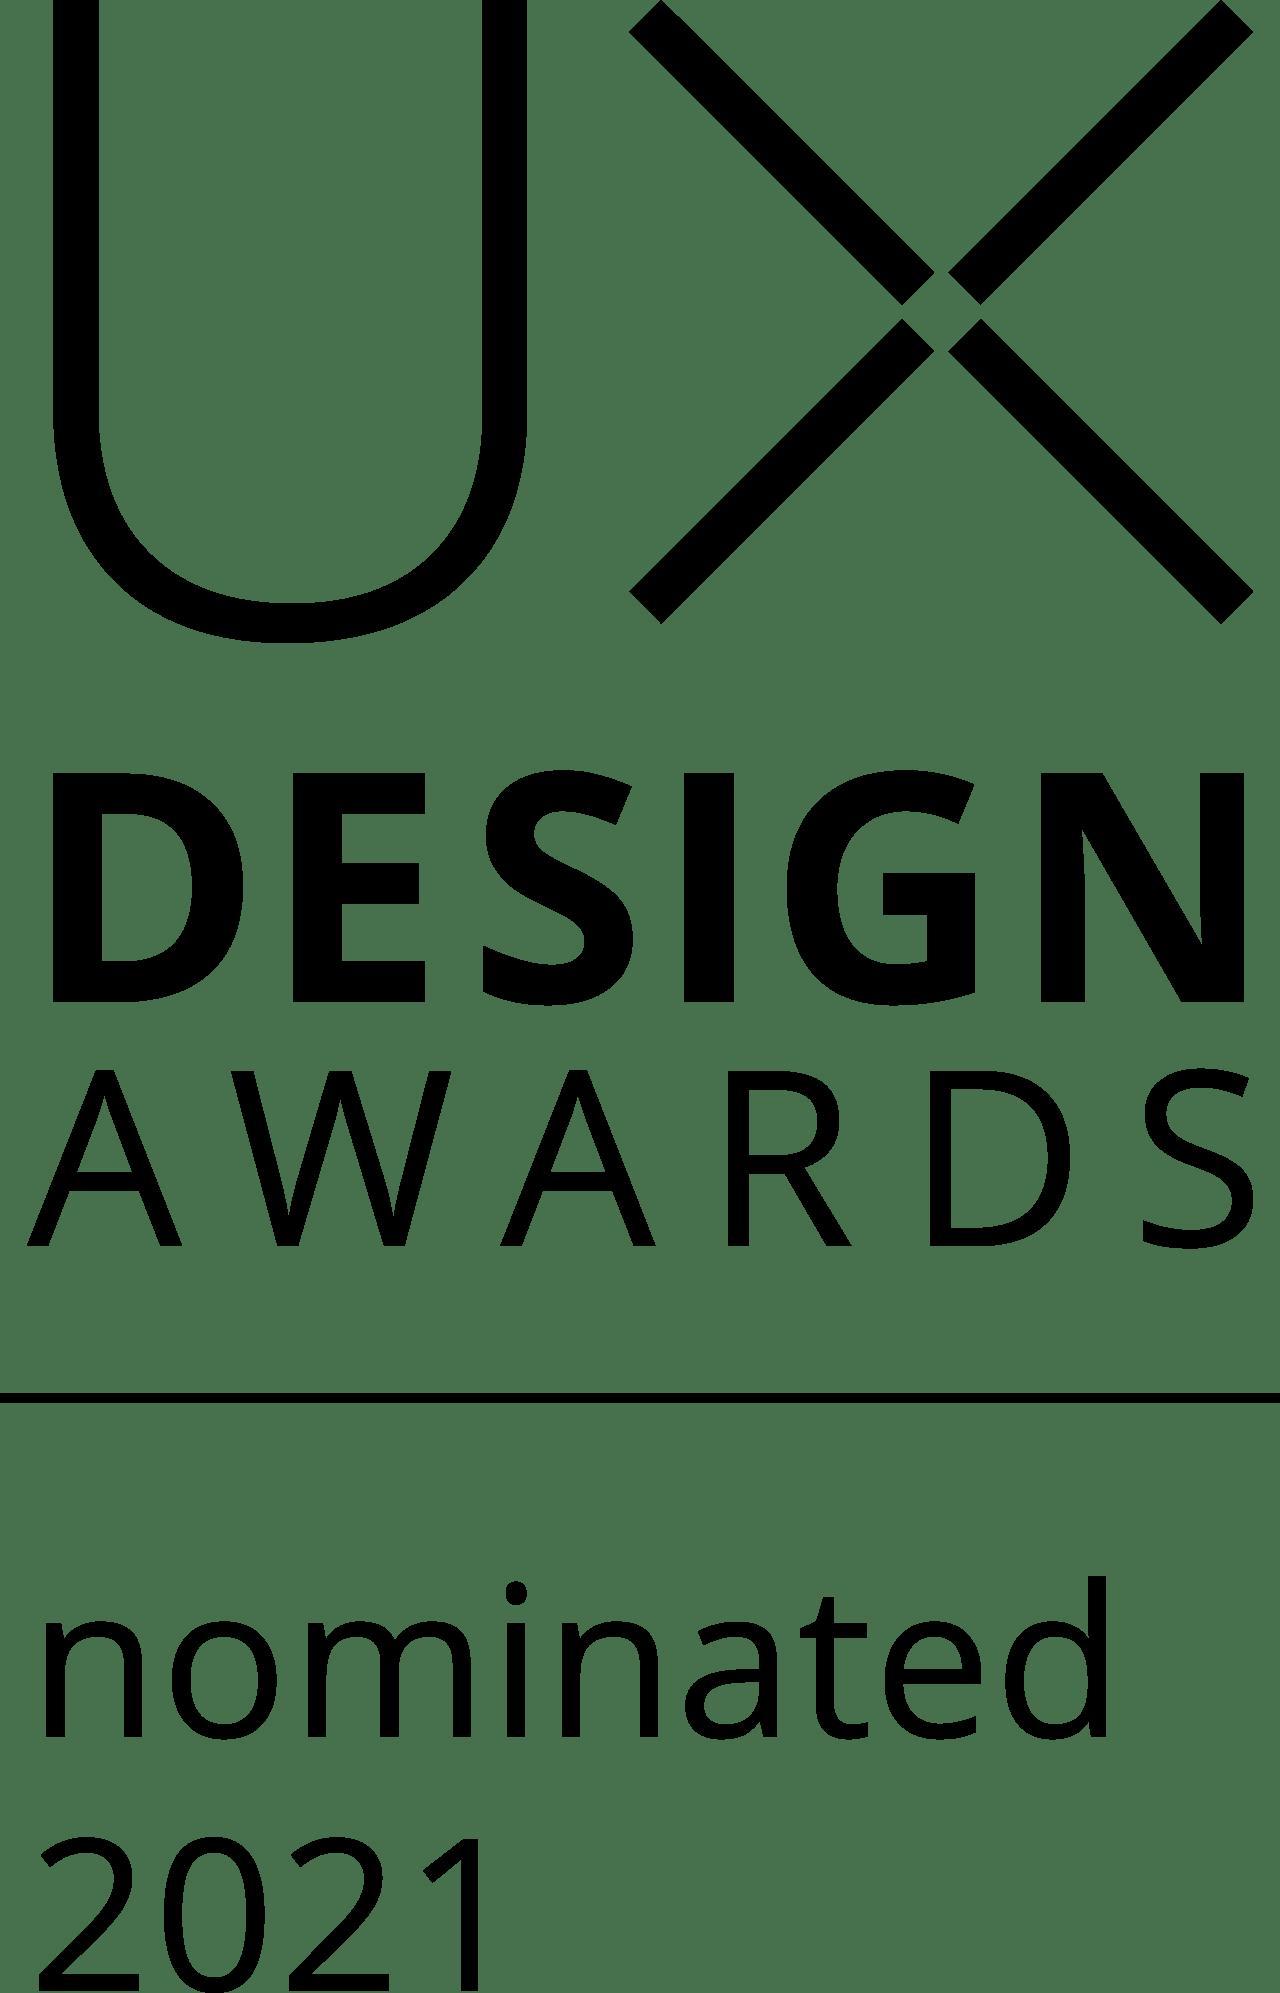 UX Design Award – Nominated 2021